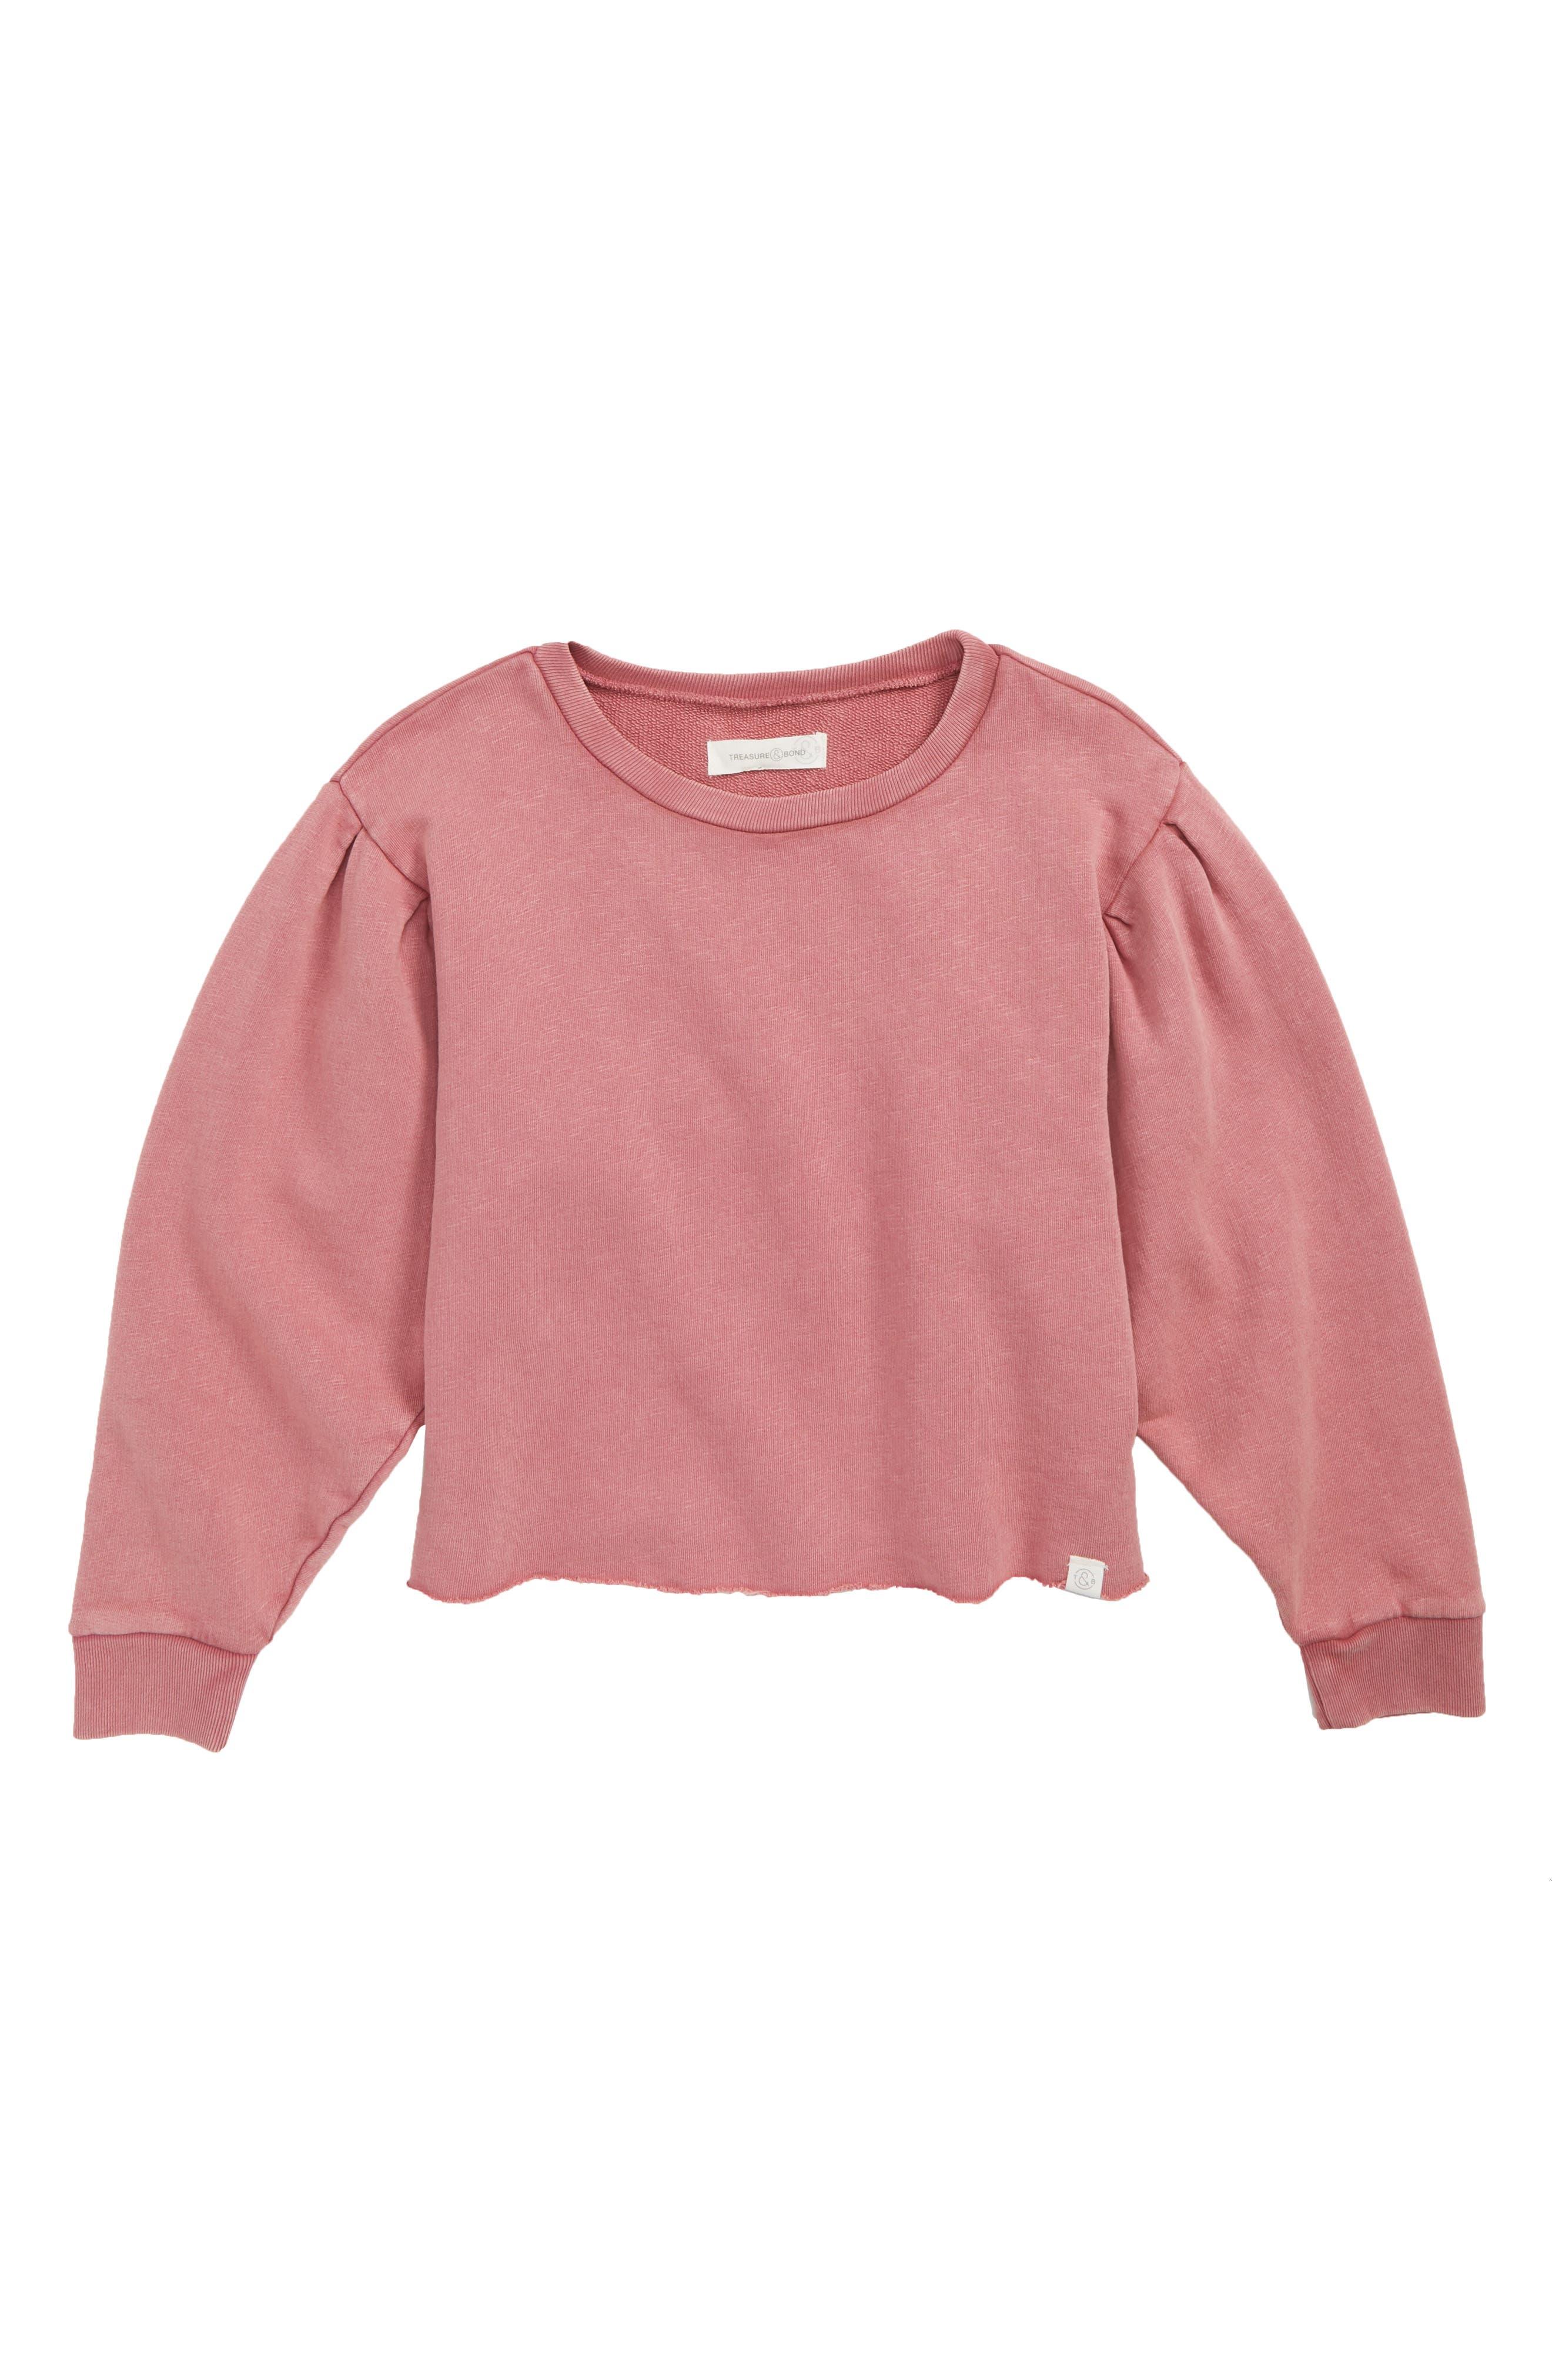 Bubble Sleeve Sweatshirt,                         Main,                         color, PINK DECO